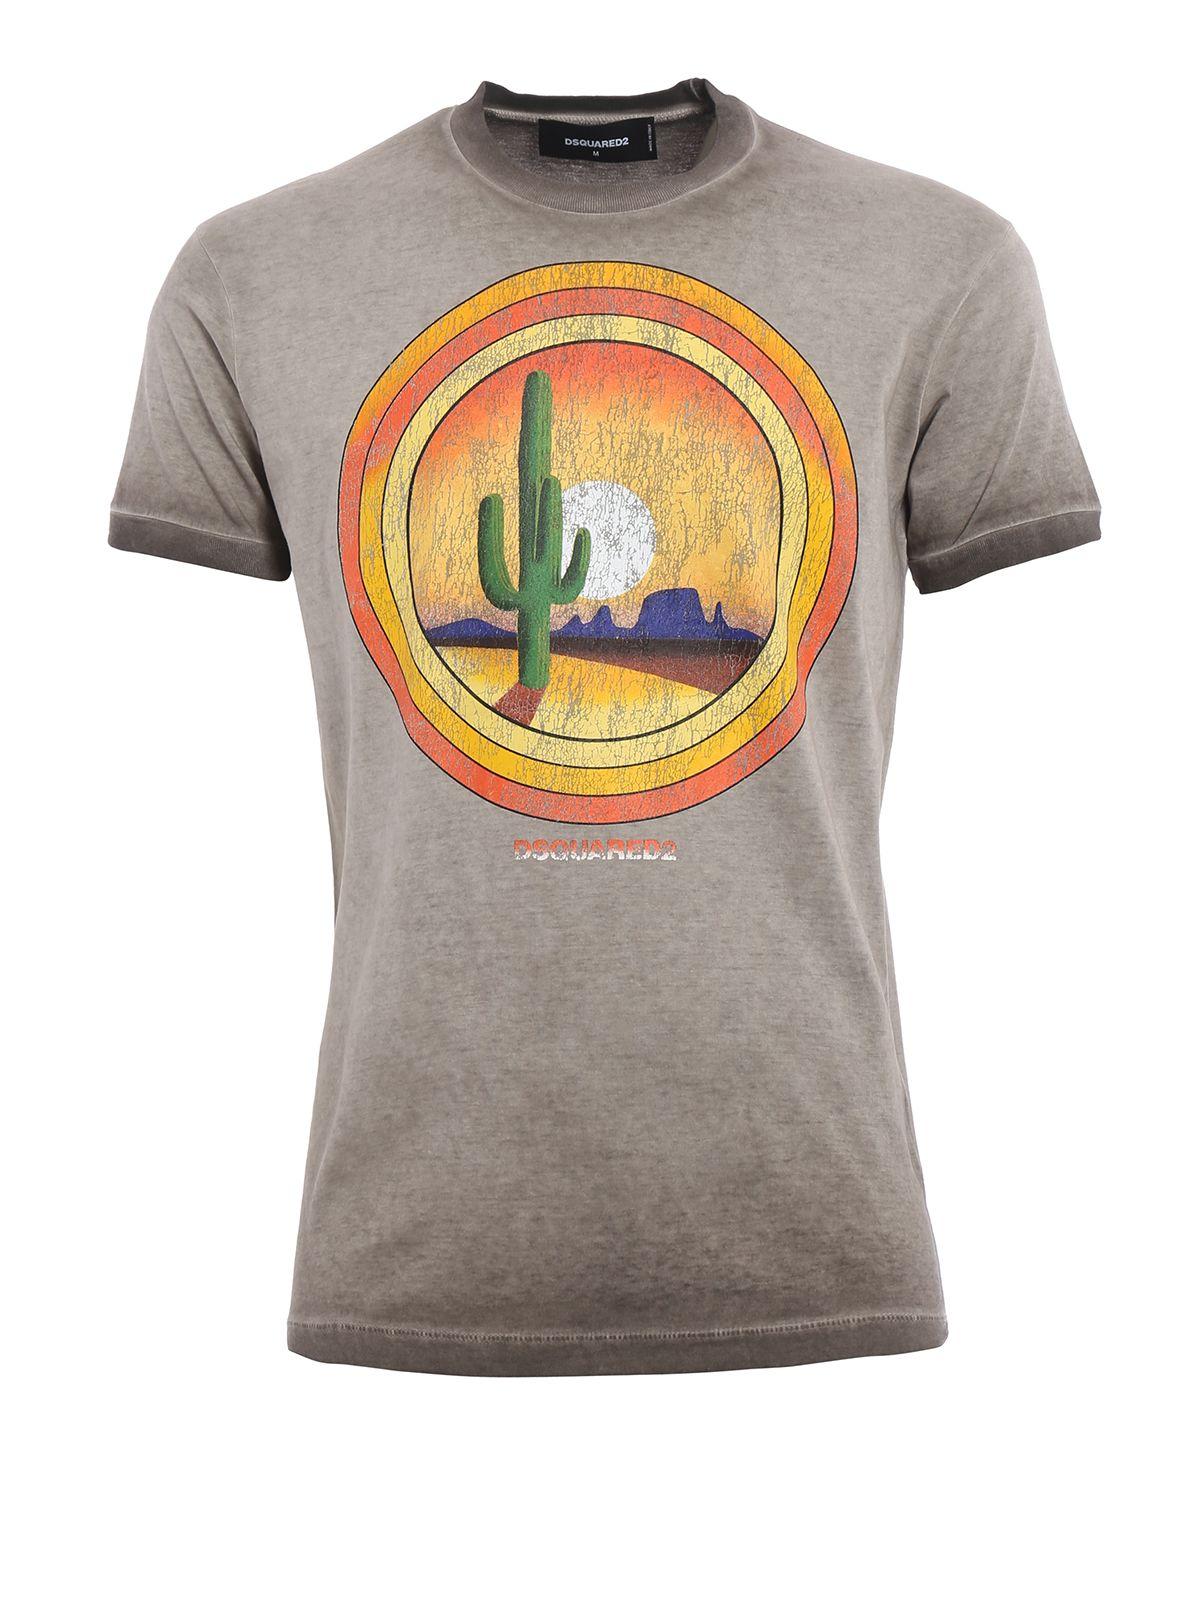 Mexico Print T-shirt